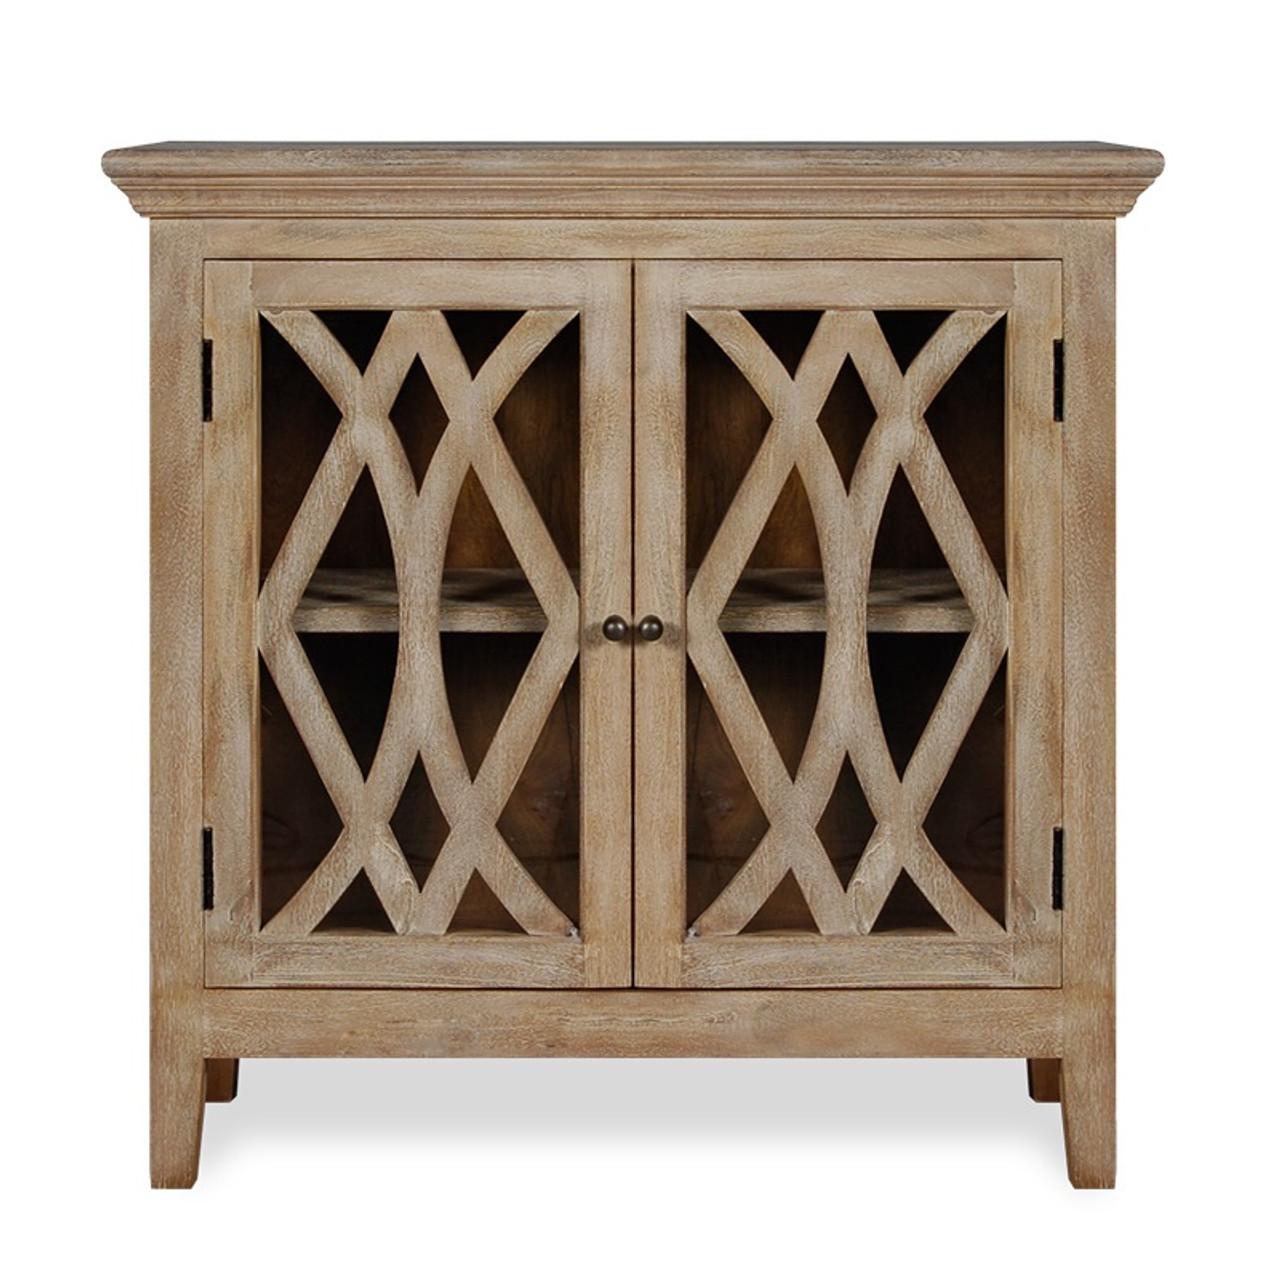 Somerset Small Wood Sideboard Buffet | Zin Home